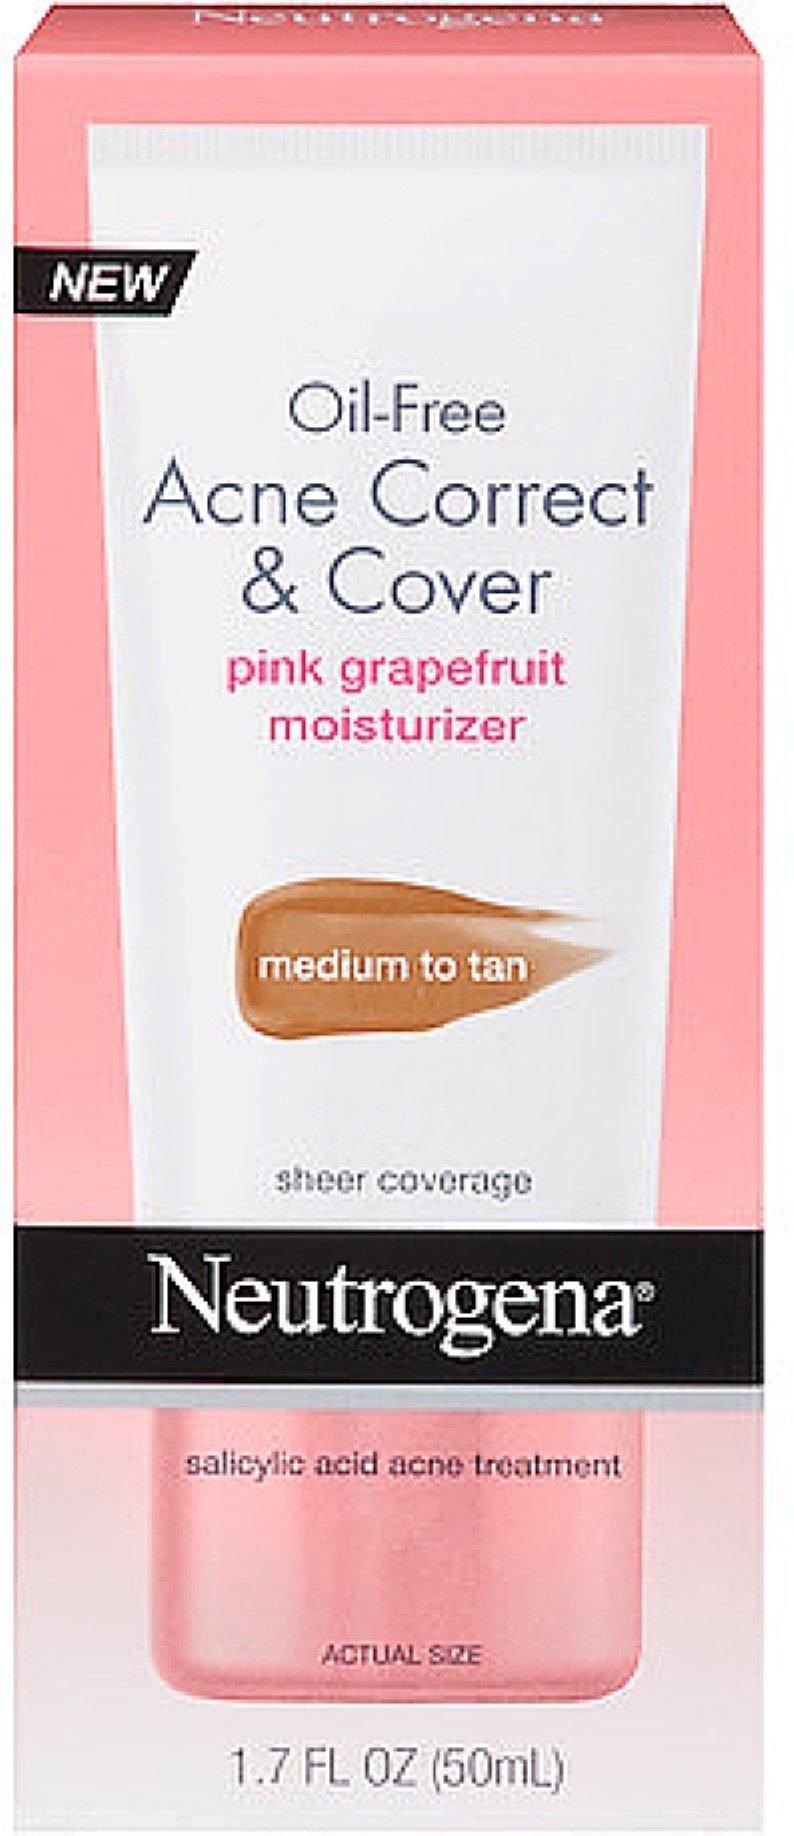 Neutrogena Oil-Free Acne Correct & Cover Pink Grapefruit Moisturizer, Medium to Tan 1.7 oz (12 Pack)